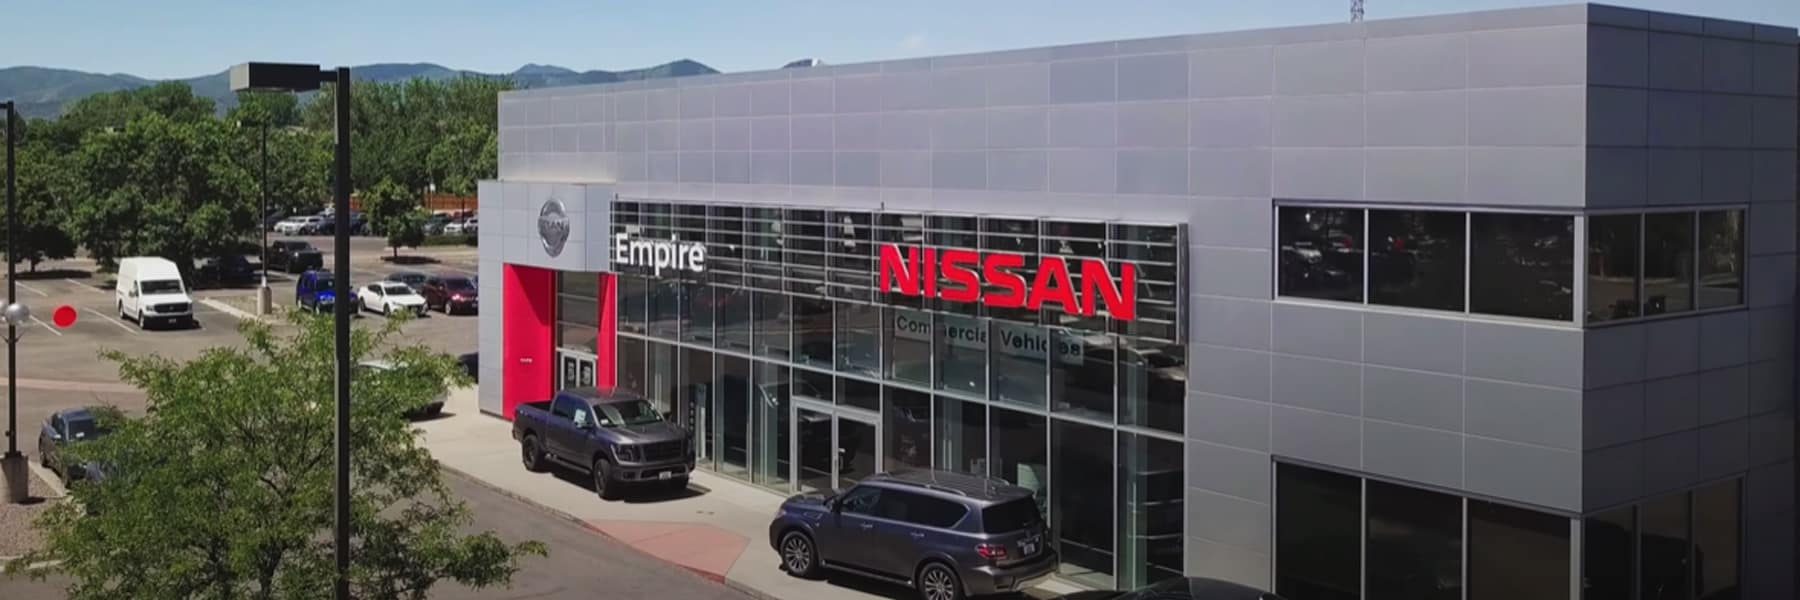 Empire Nissan of Littleton aerial